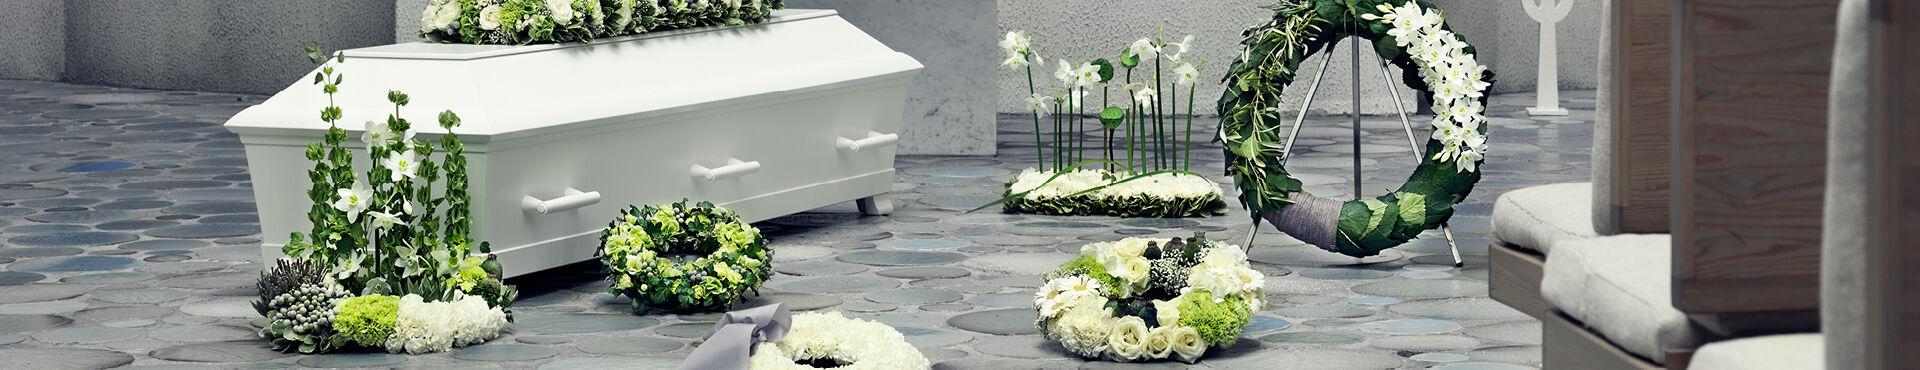 Blomsterguide til begravelse